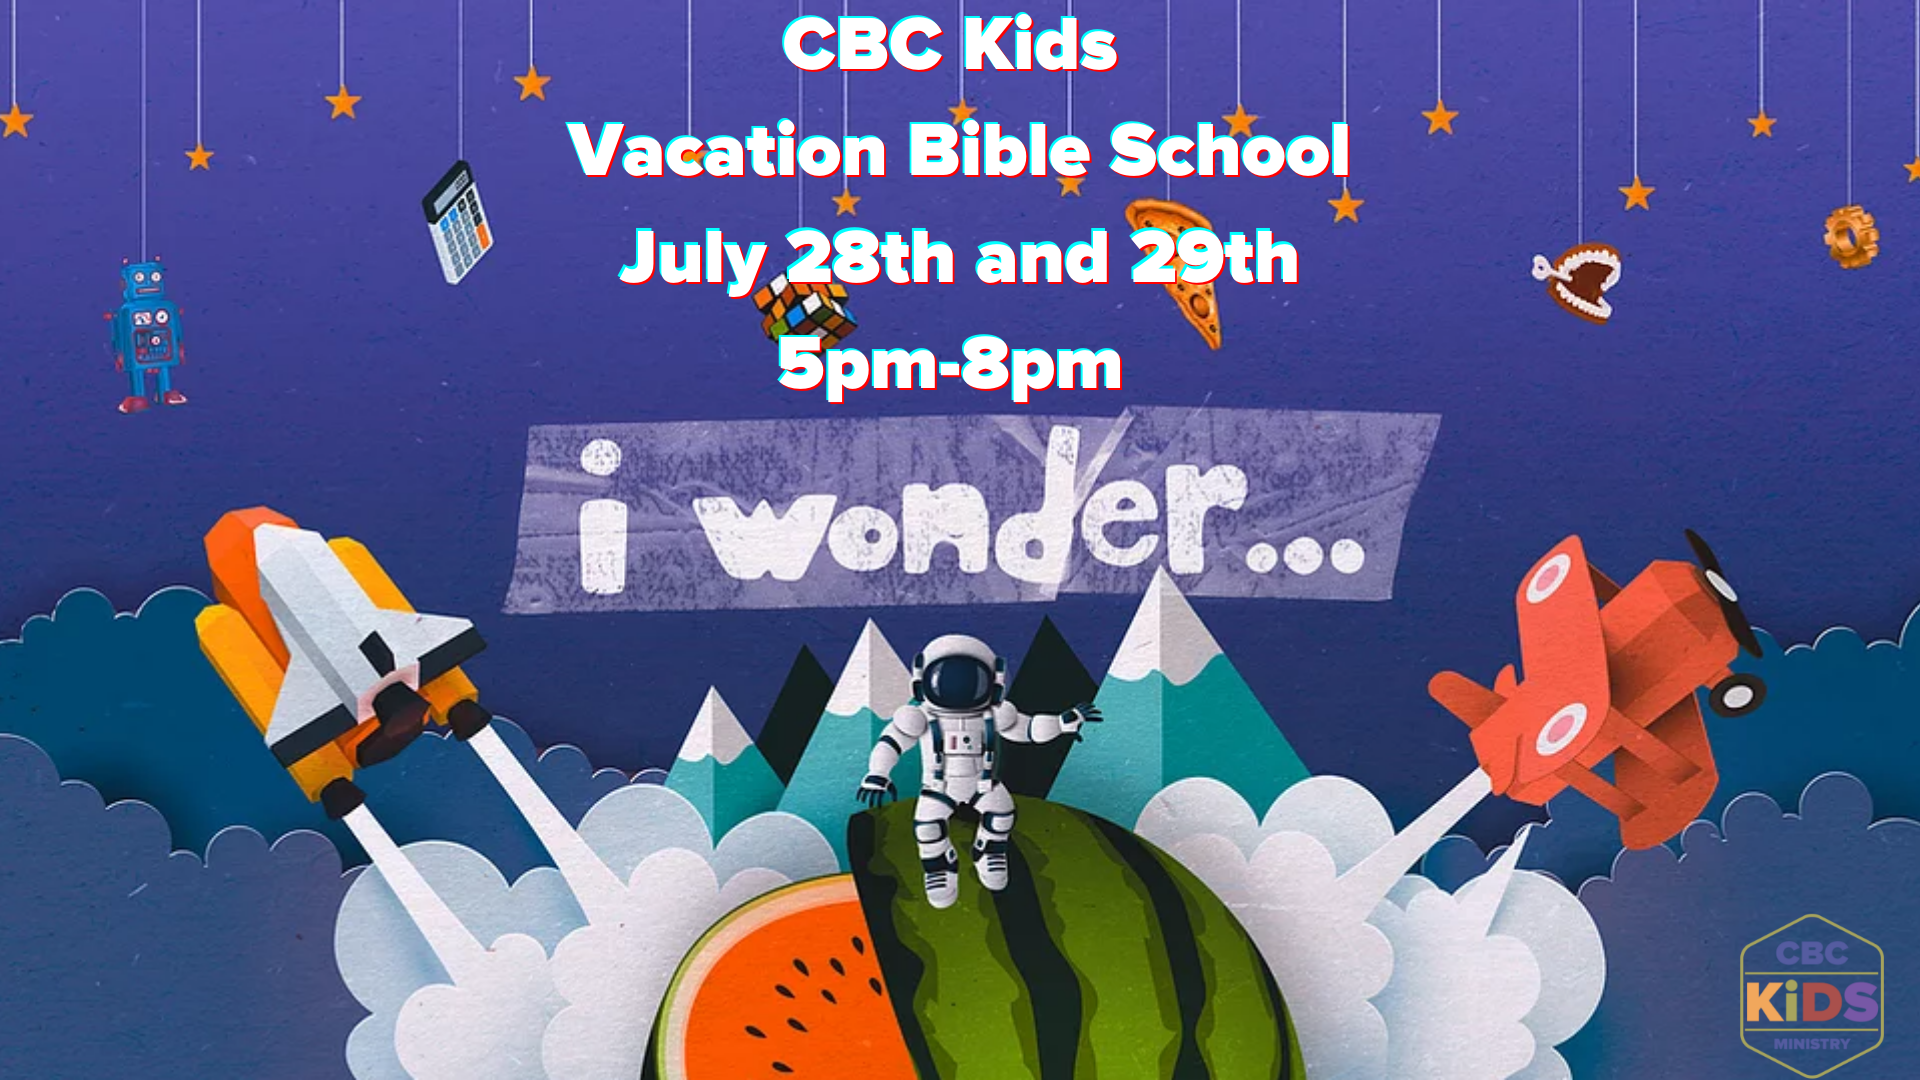 copy-of-cbc-kids-vacation-bible-school-2